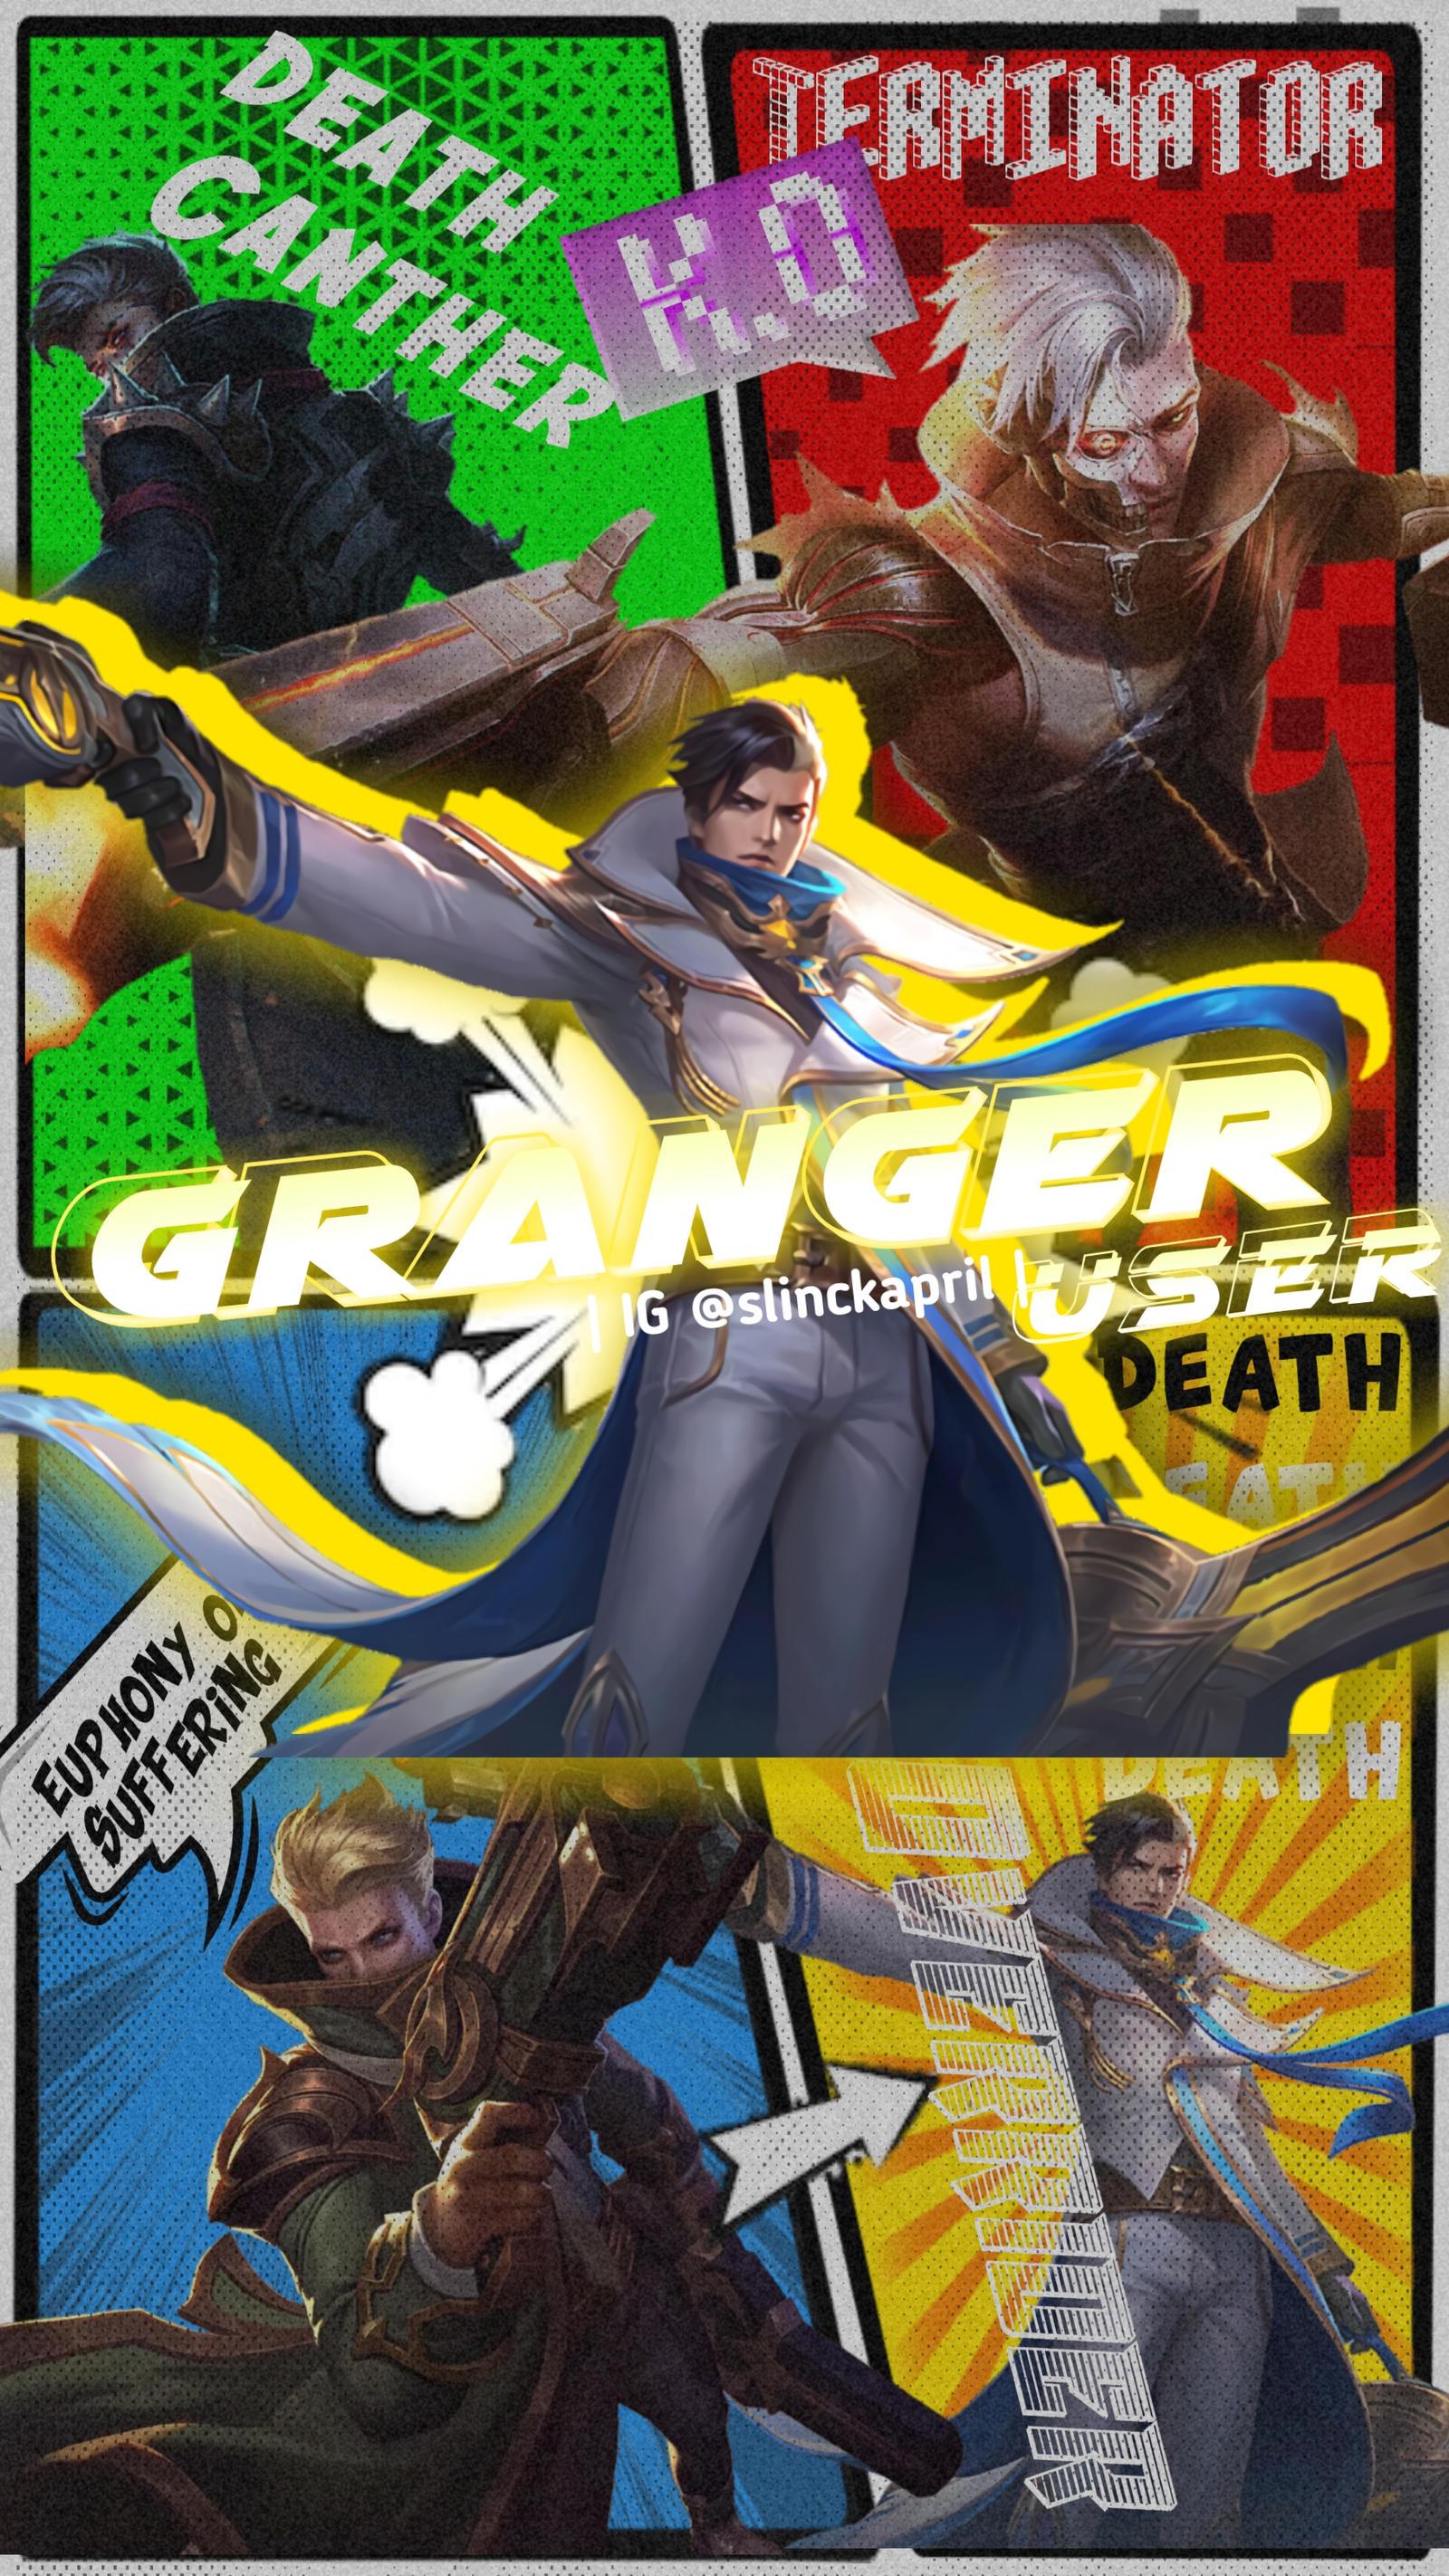 Granger Mobile Legends Wallpaper Lightborn Hd By Slinckapril On Deviantart